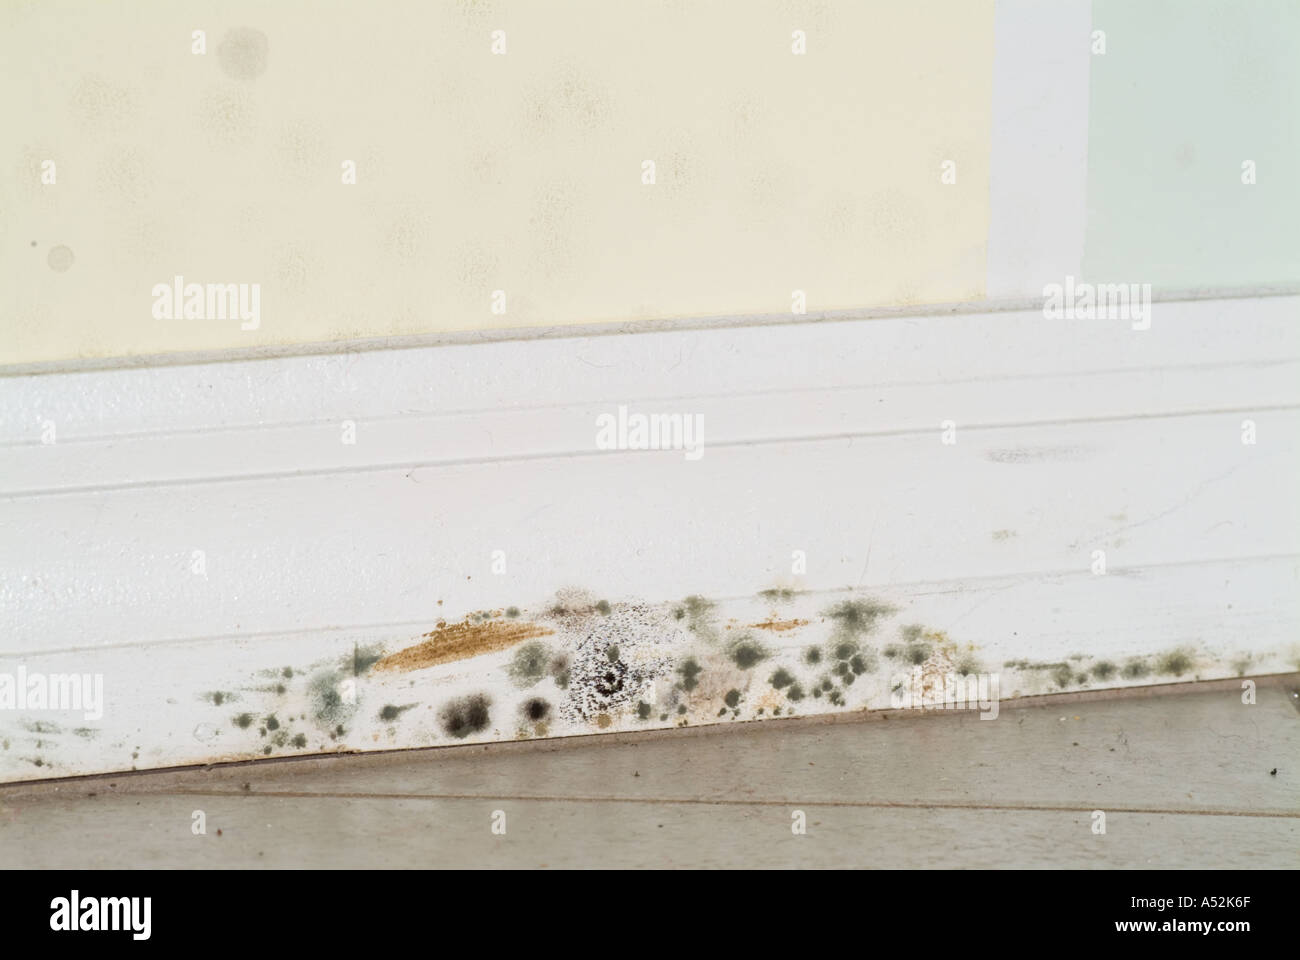 Stock Photo   mold mildew on inside wall along baseboard molding storm  damage water damaged home. Mold Mildew On Inside Wall Along Baseboard Molding Storm Damage